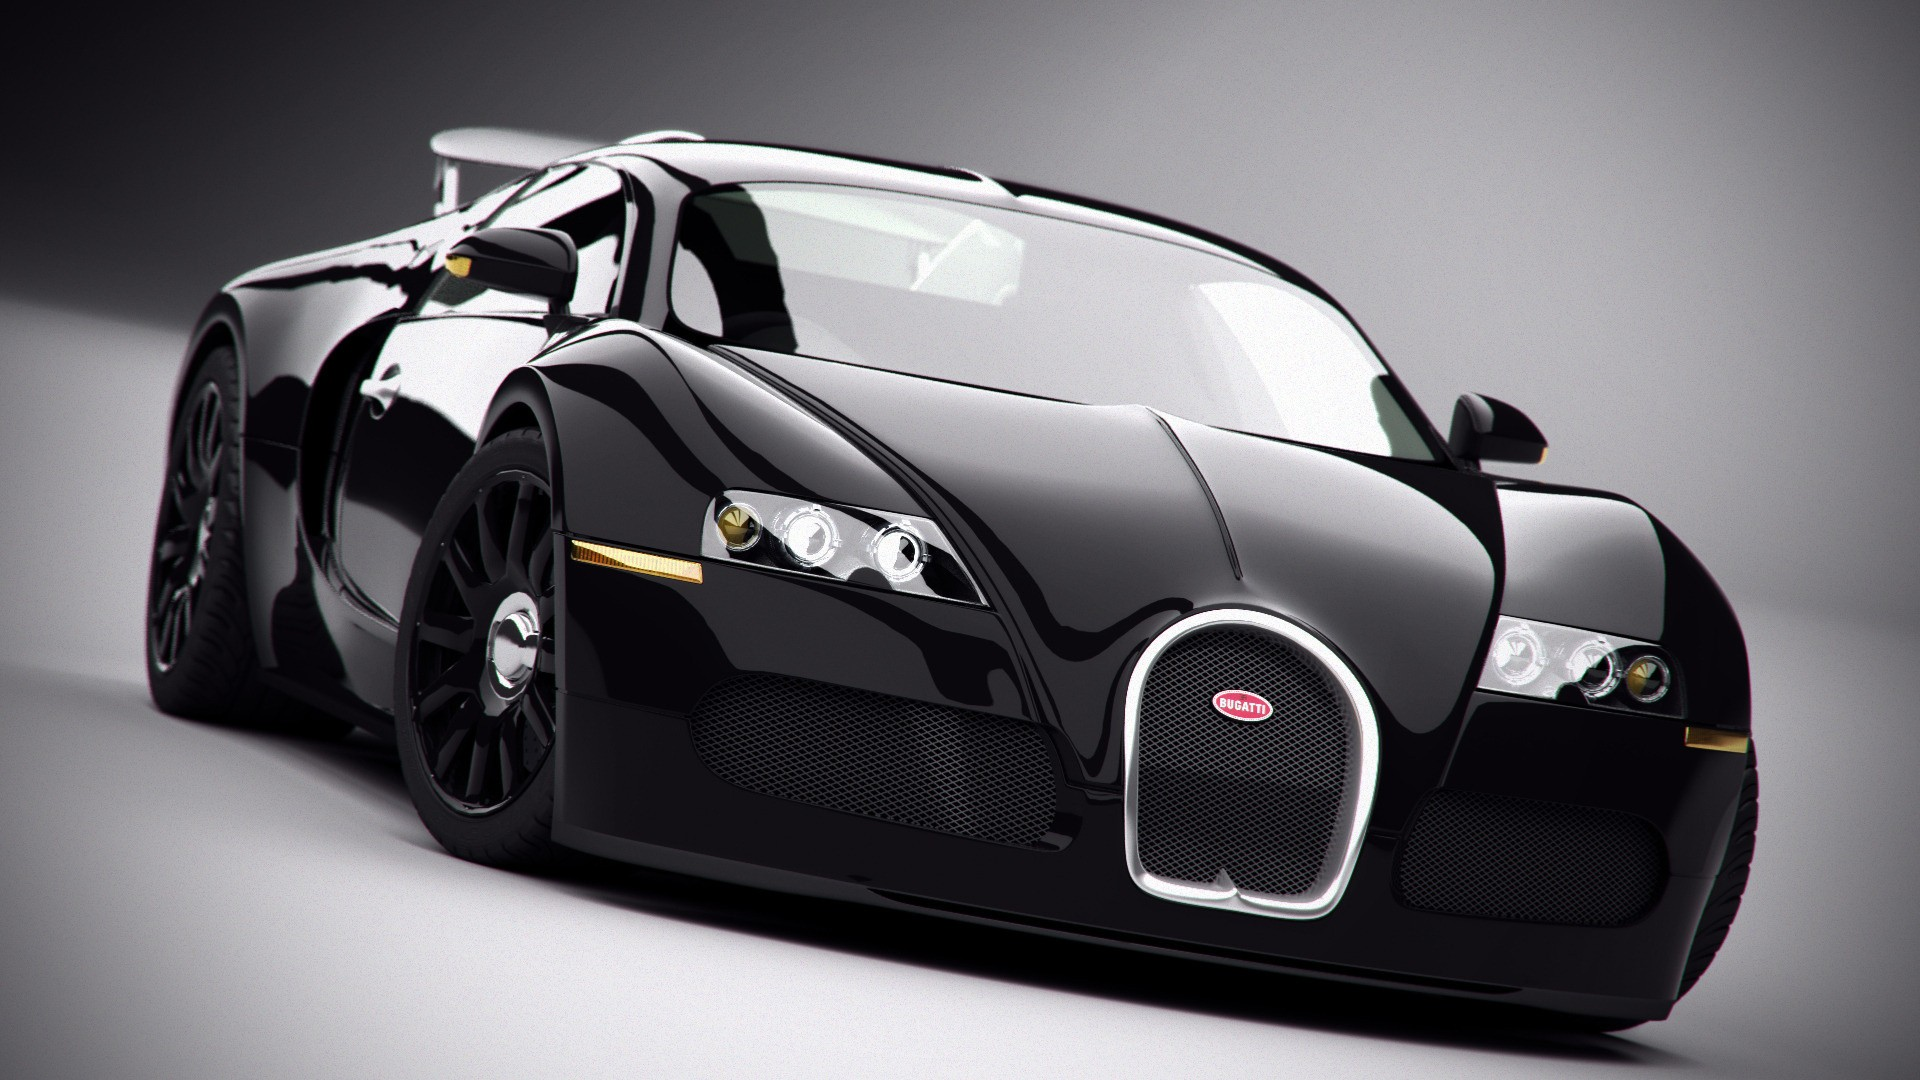 Black Range Rover Sport Wallpaper: Black Bugatti Veyron 1080p Wallpaper-For Desktop